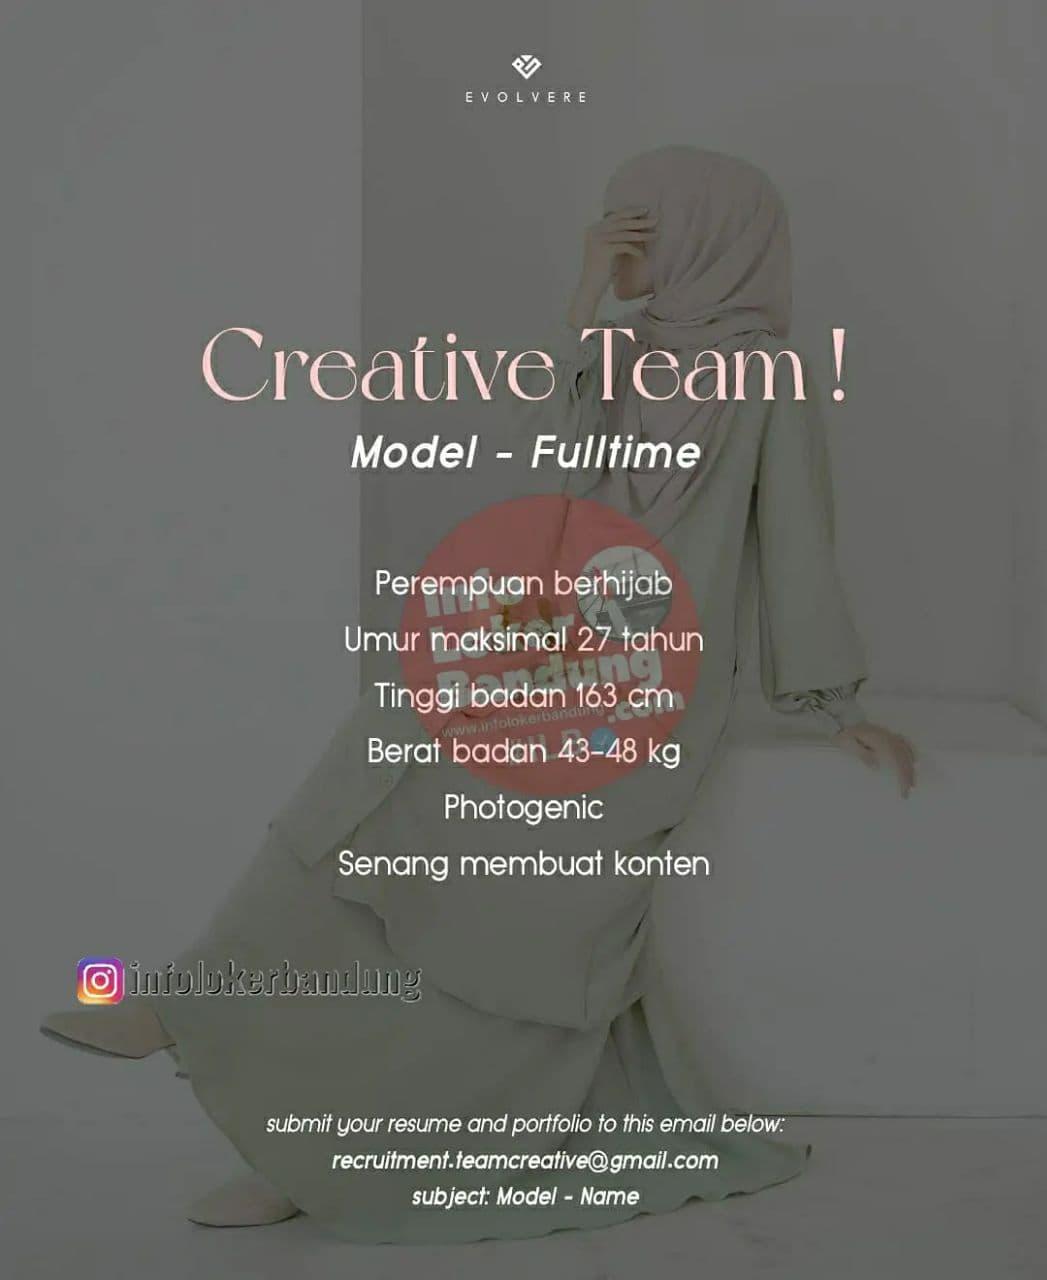 Lowongan Kerja Evolvere Bandung Oktober 2021